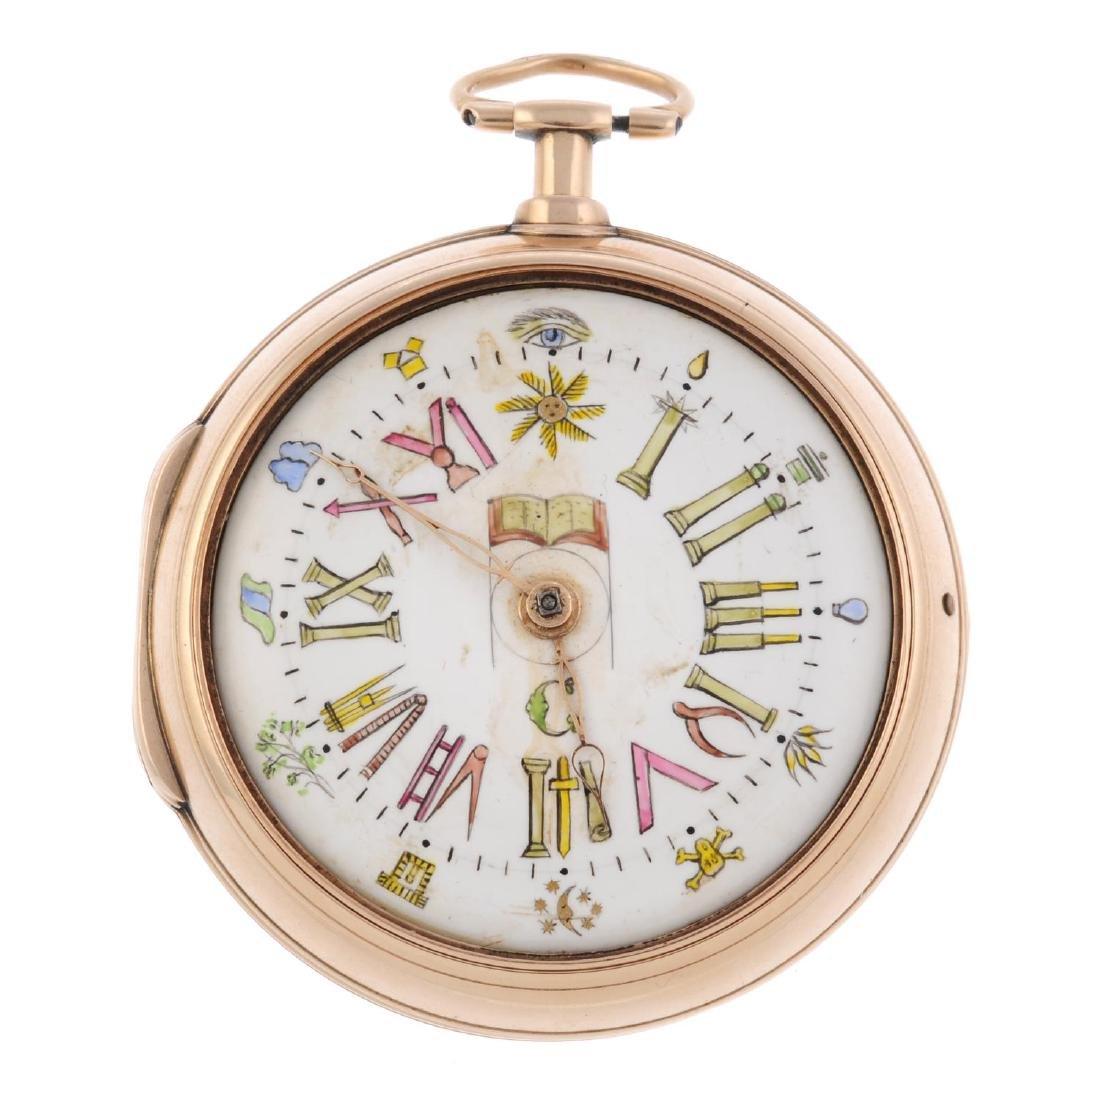 A pair case Masonic pocket watch by T. Earnshaw. 18ct